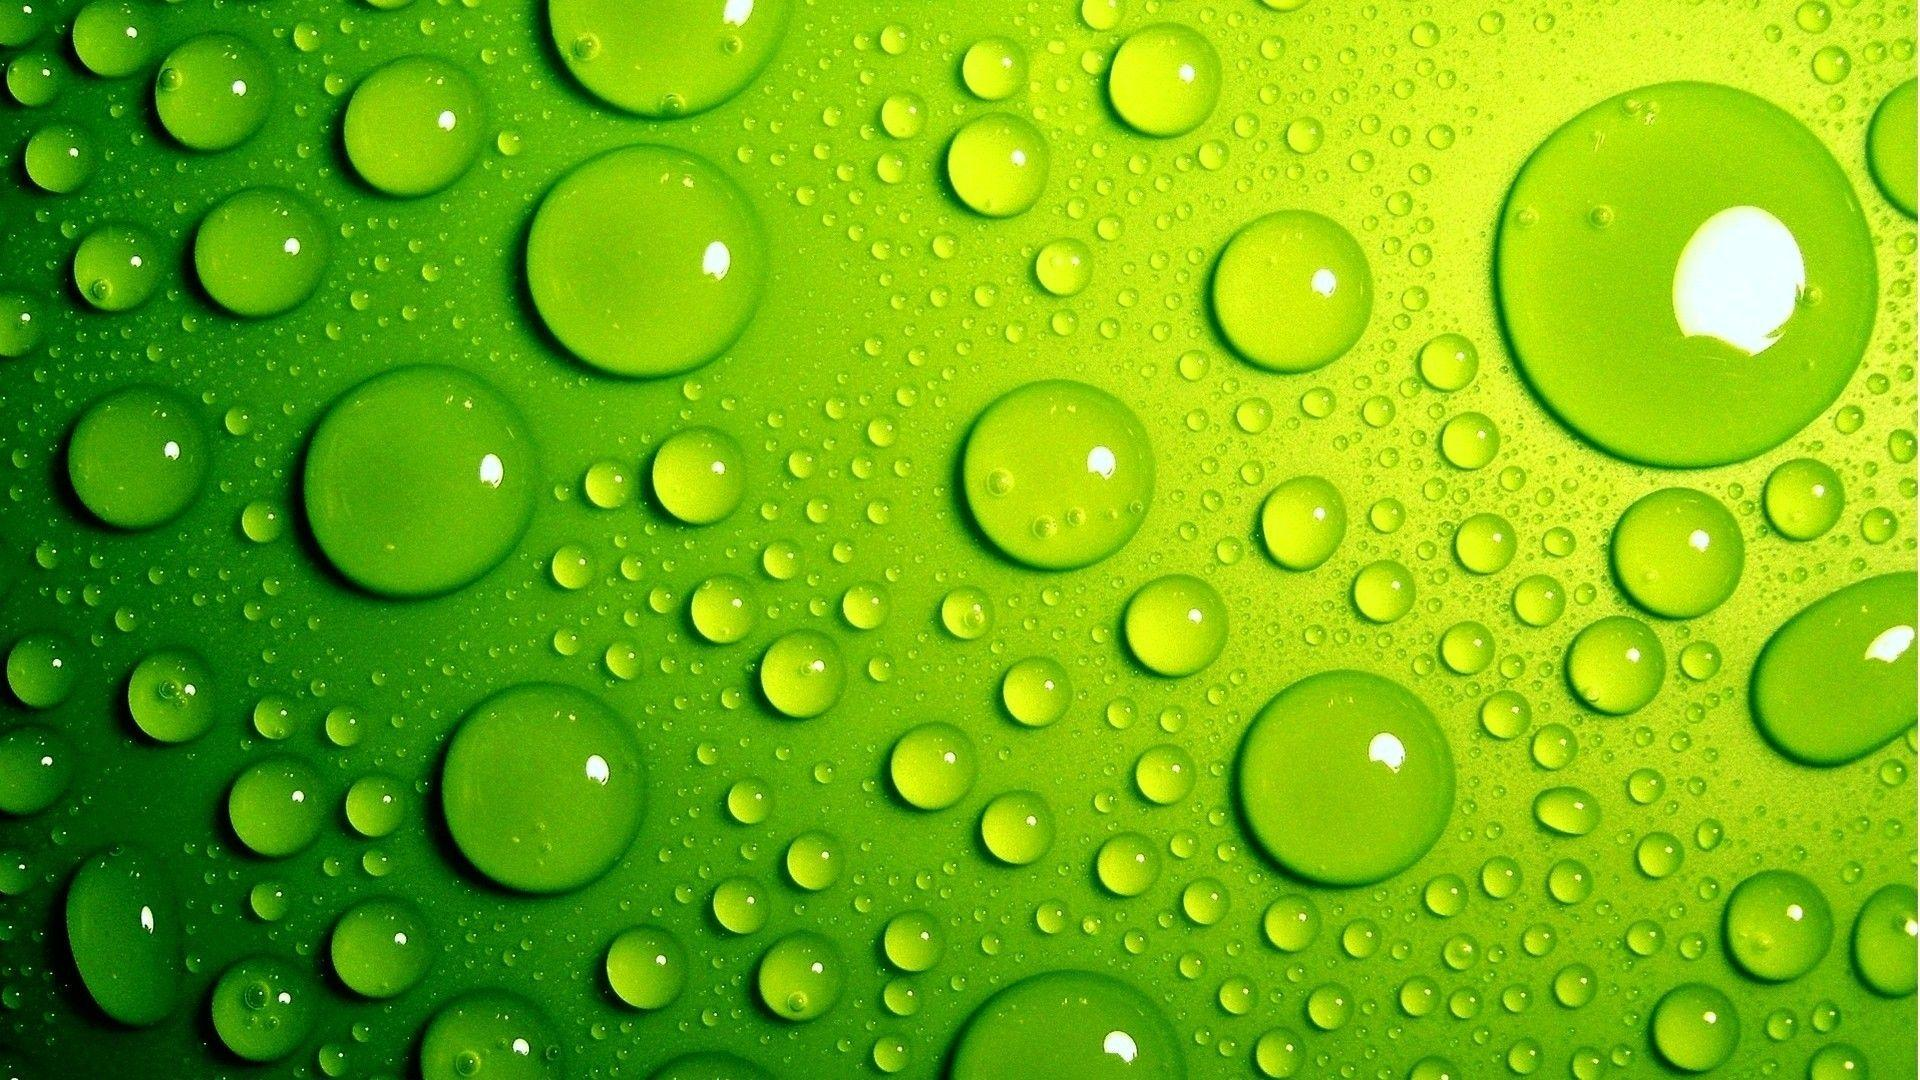 Water Drop HD Wallpapers 1920x1080